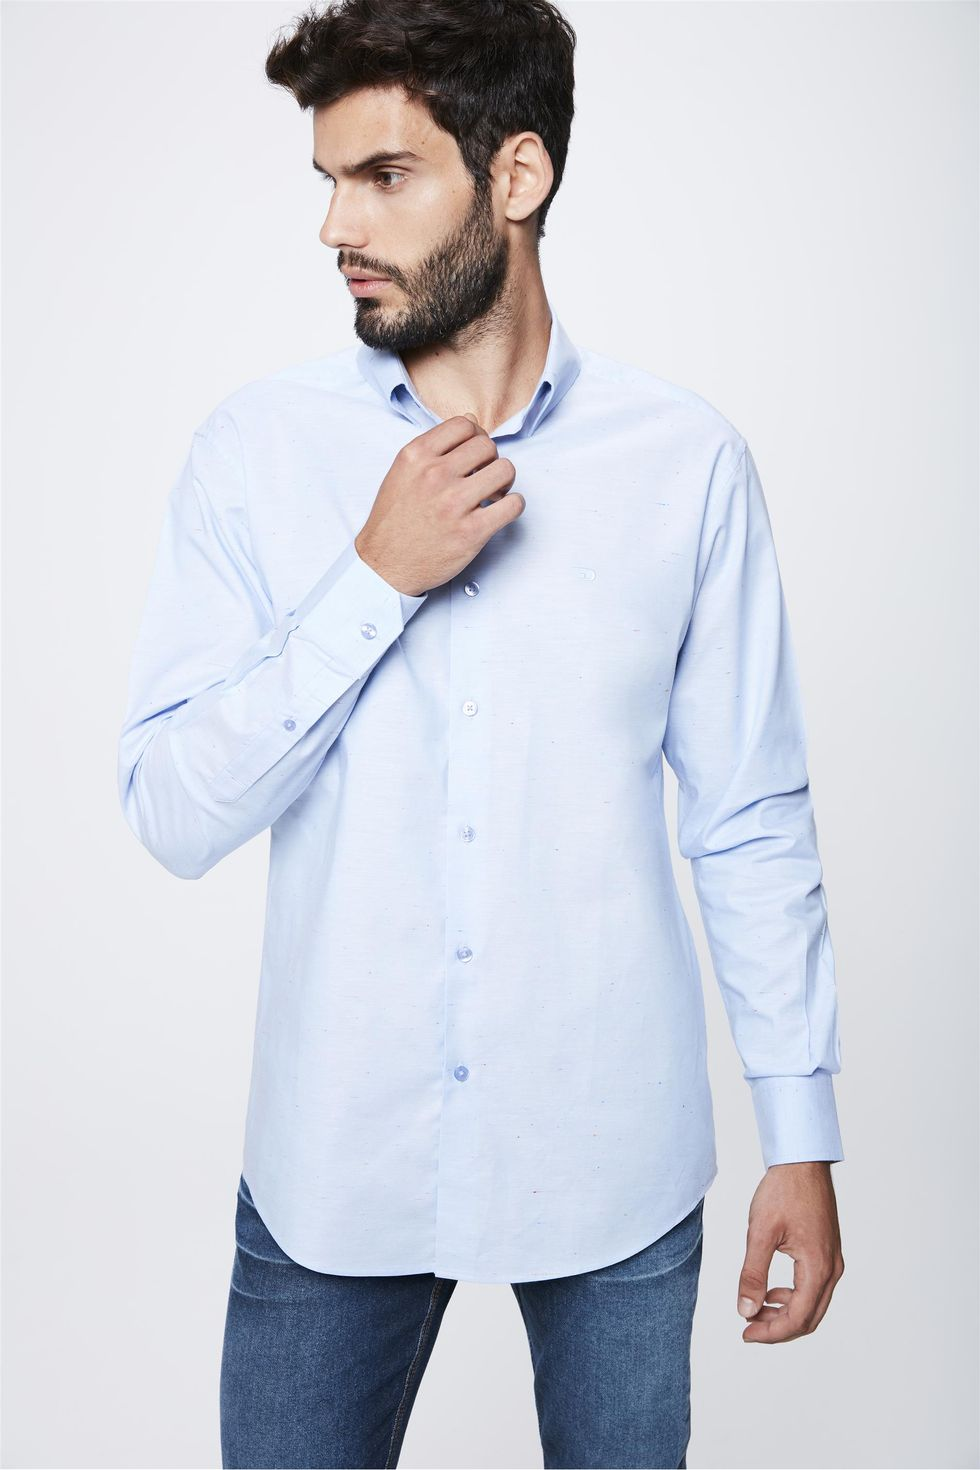 Camisa-Social-Manga-Longa-Masculina-Frente--